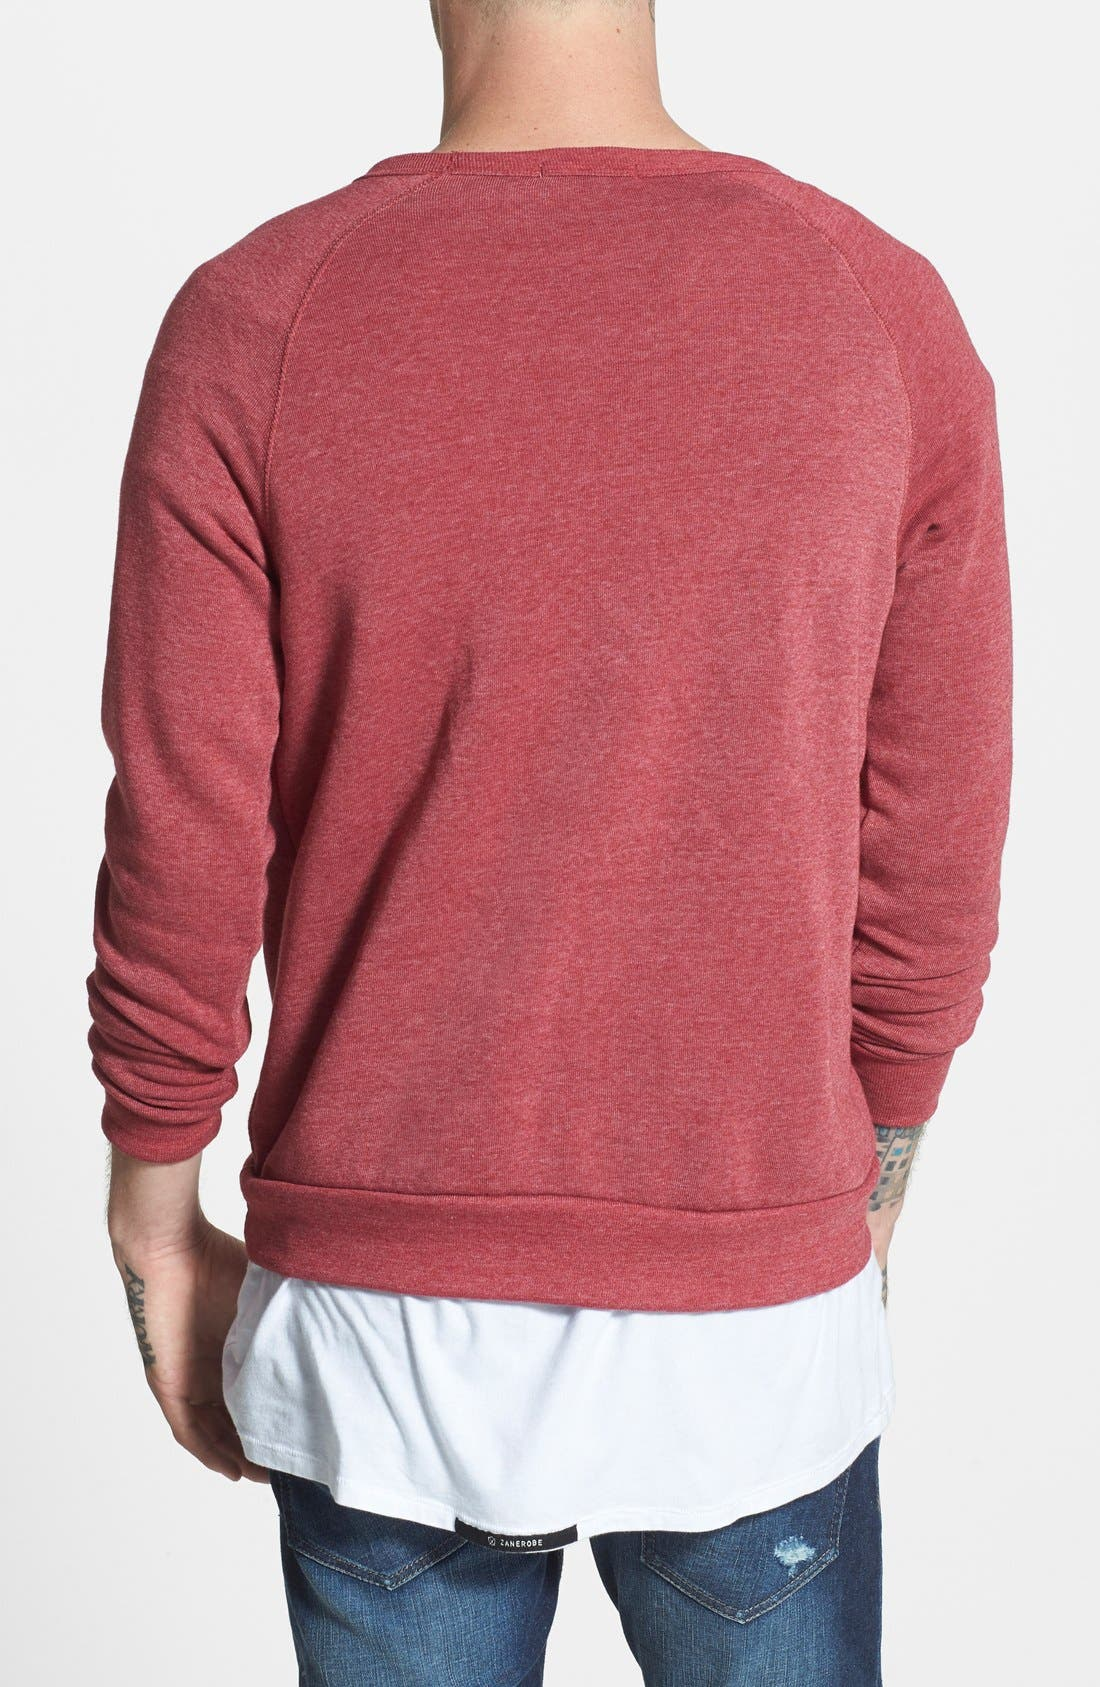 'The Champ' Sweatshirt,                             Alternate thumbnail 67, color,